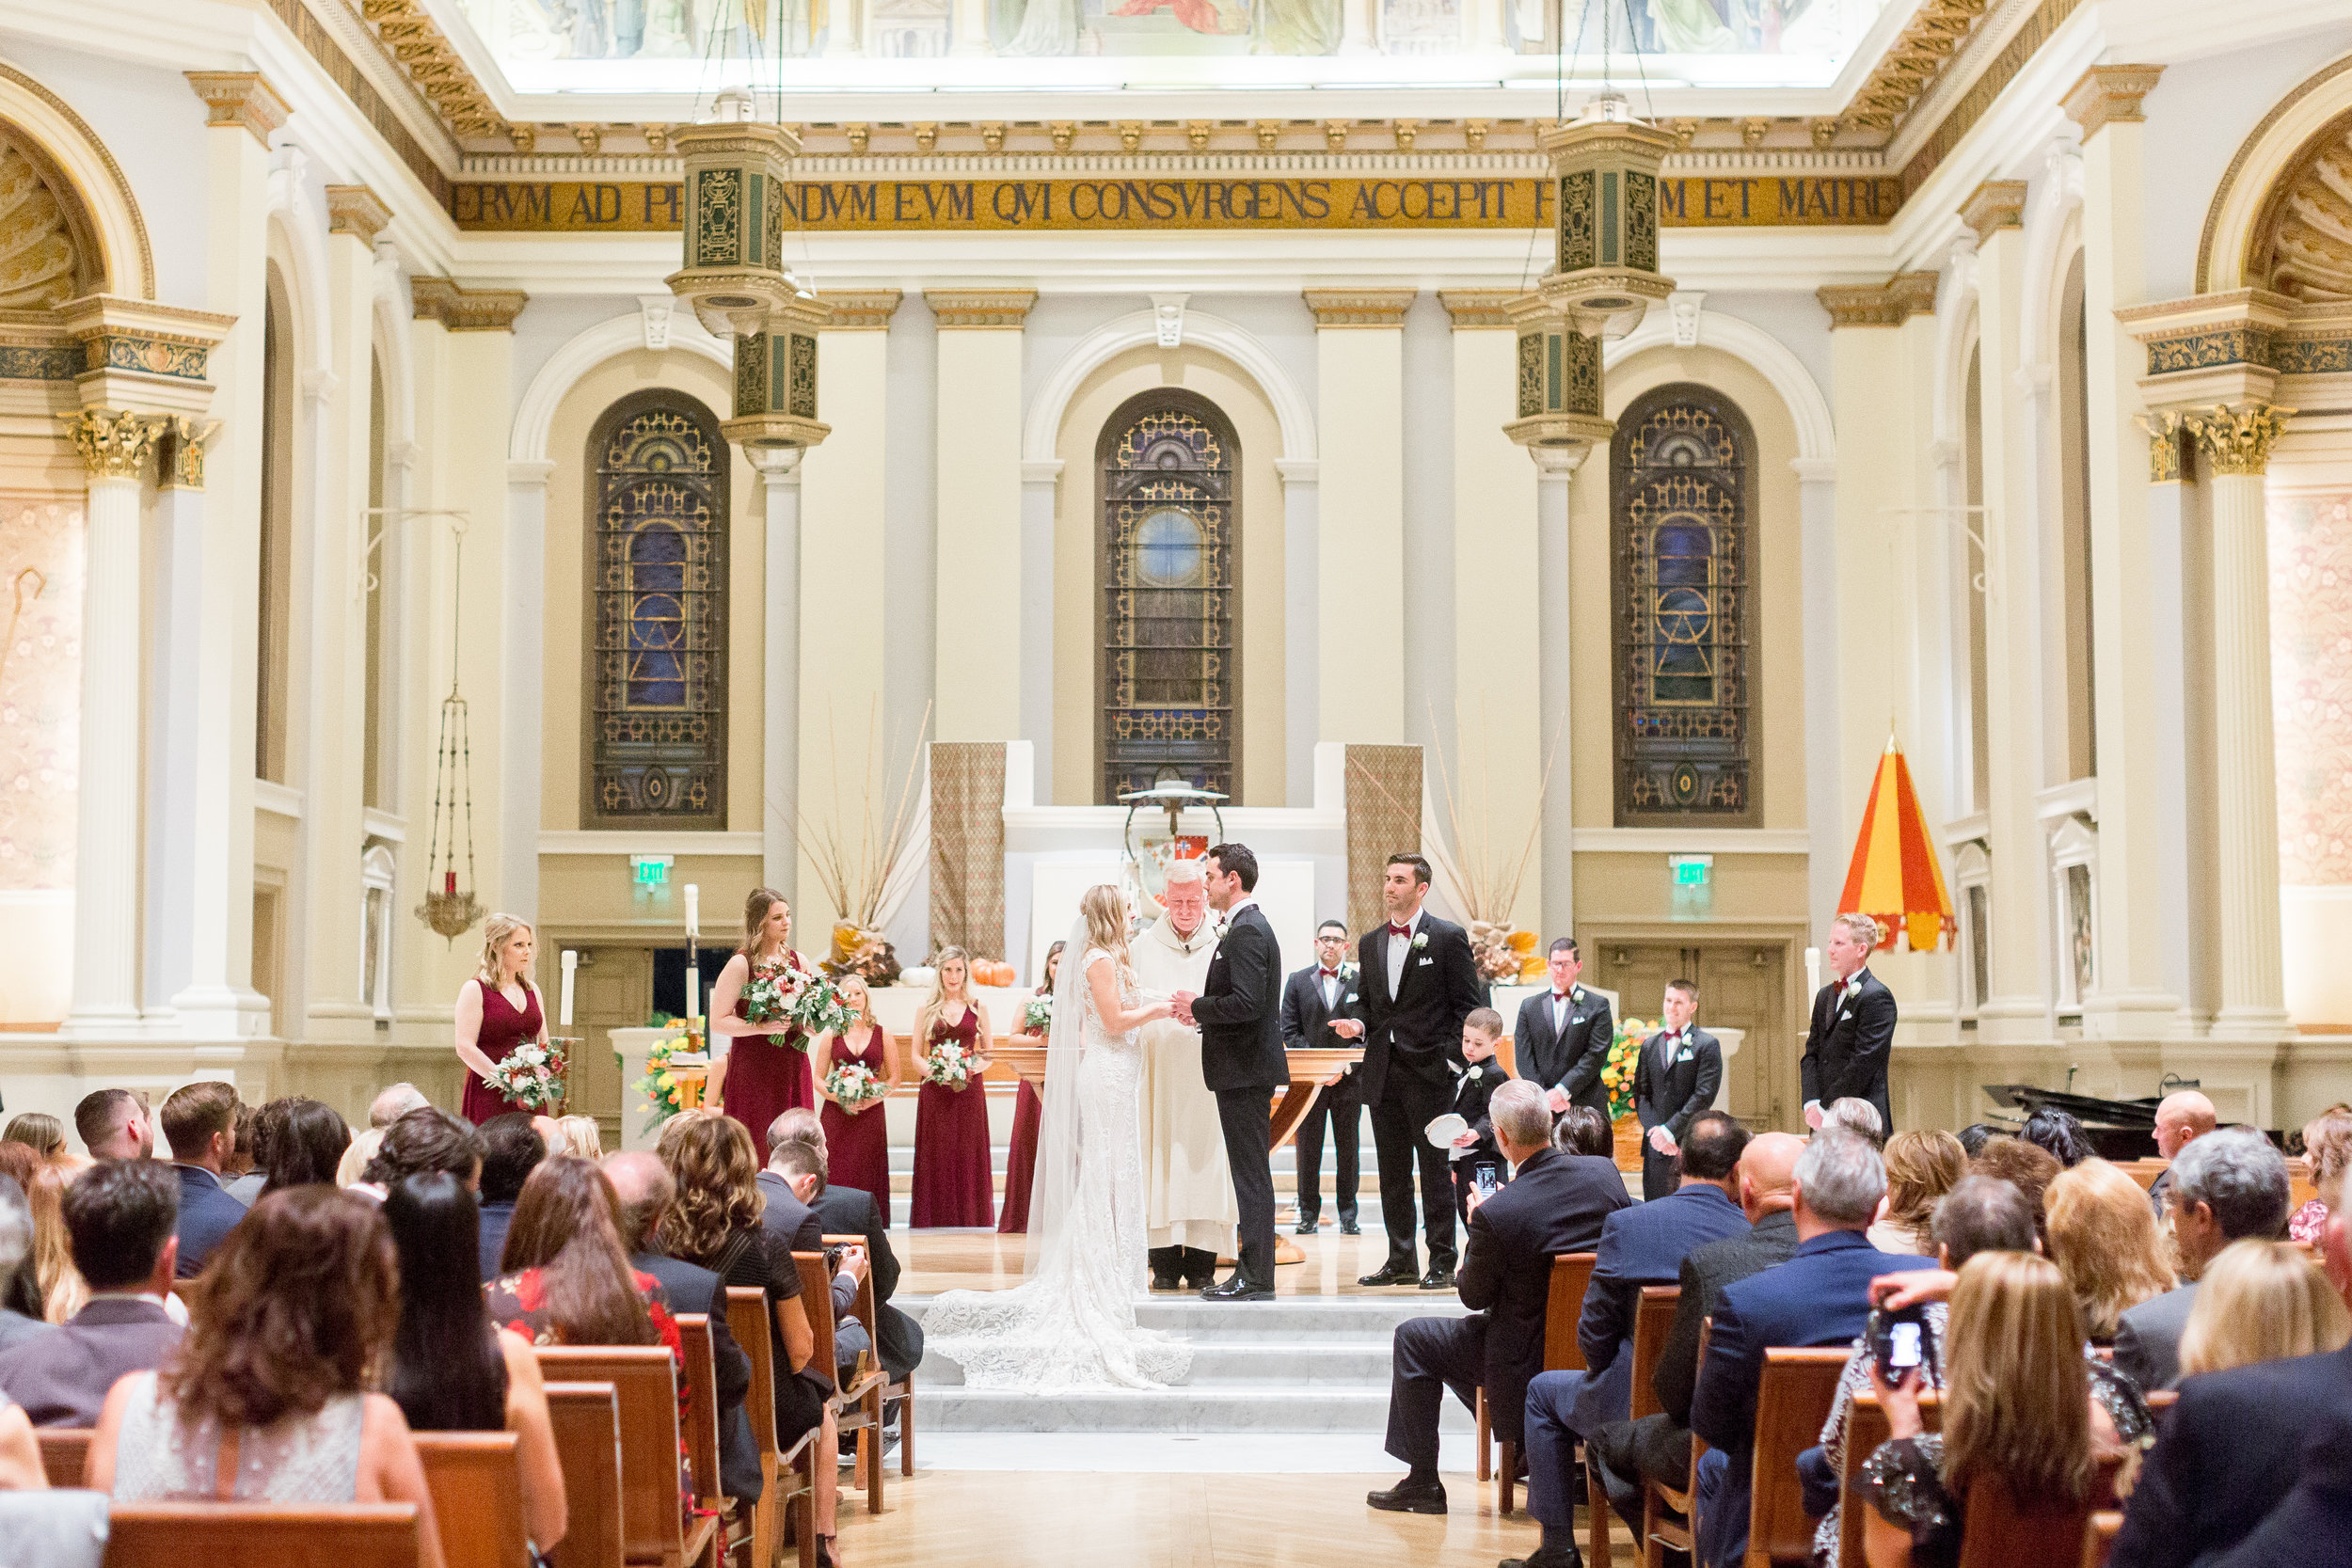 Cathedral-Basicllica-of-St.Joseph's-catholic-church-wedding-photos((230 of 335).jpg